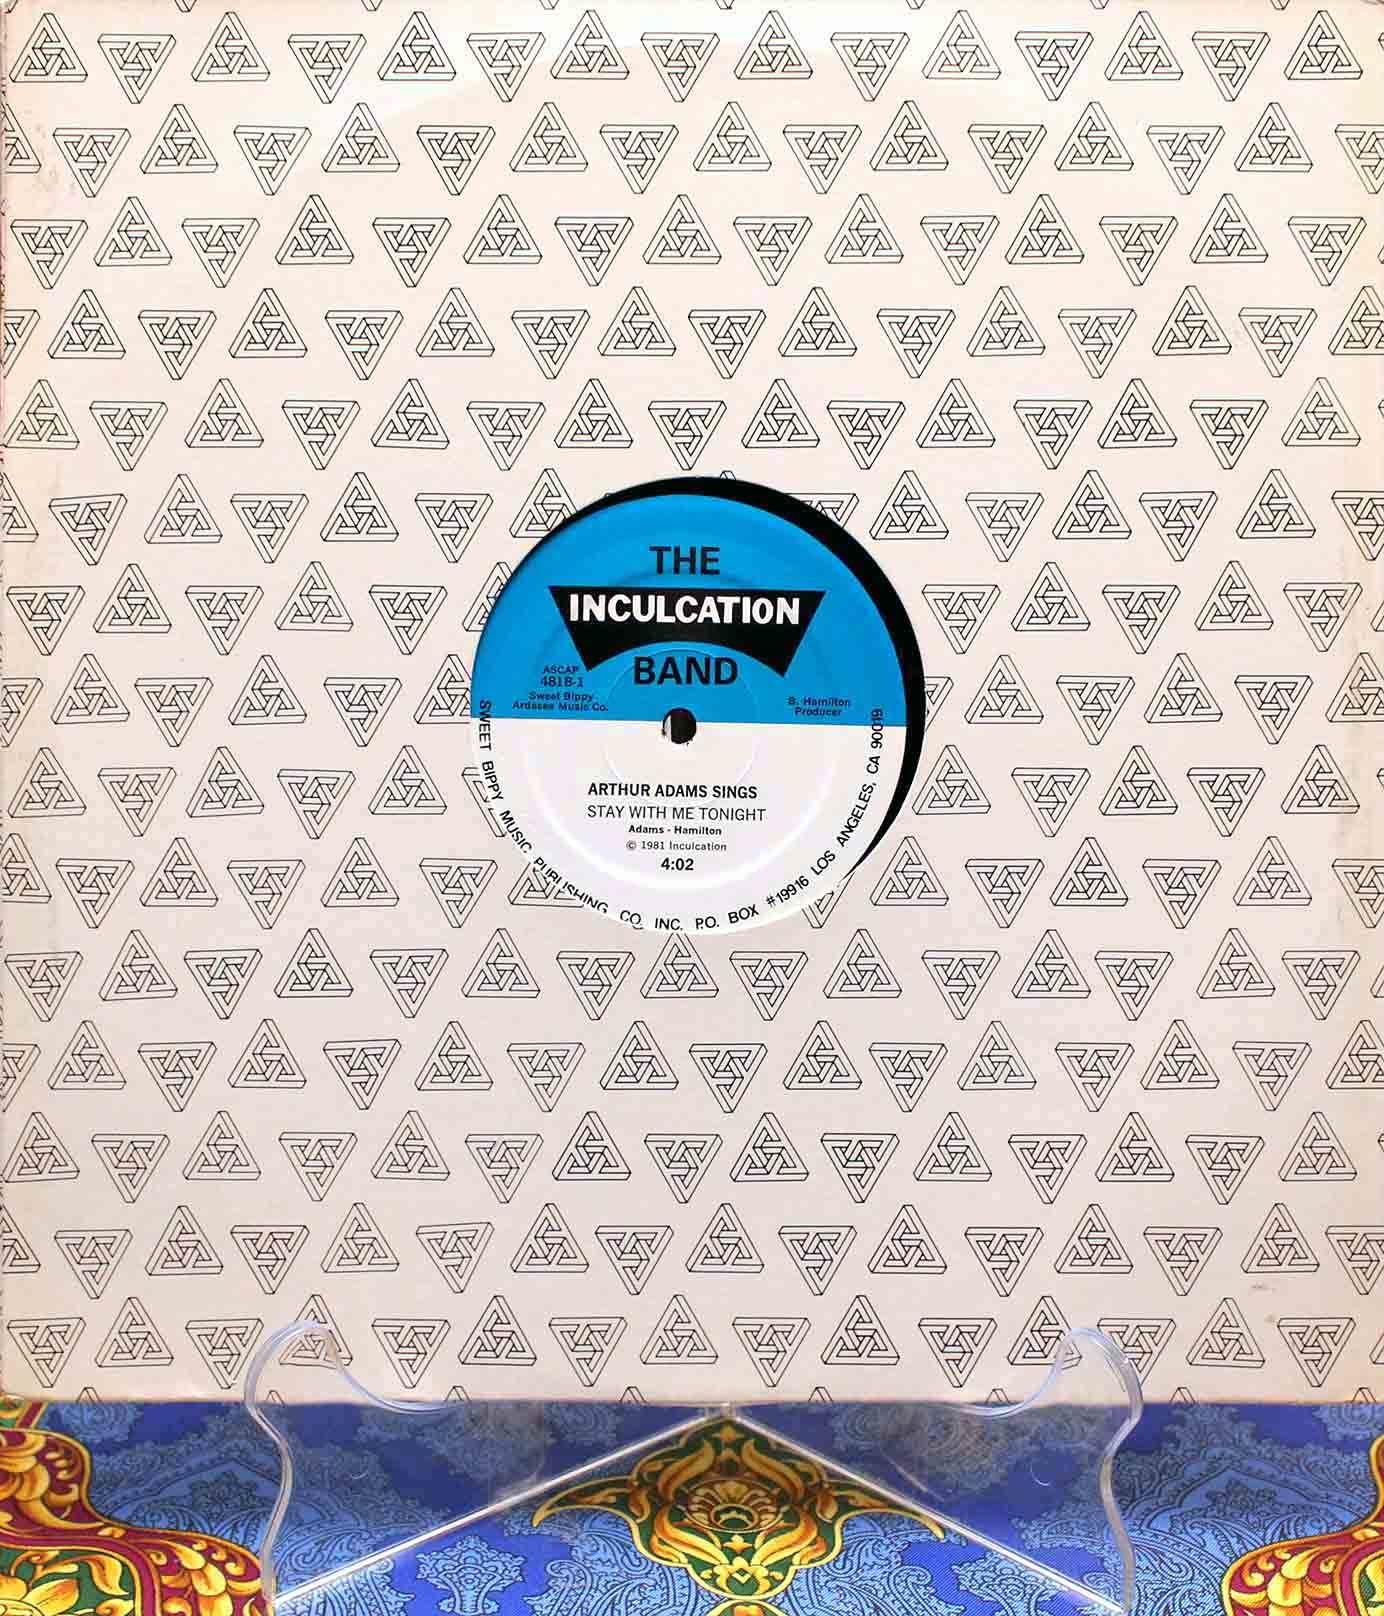 Arthur Adams – You Got The Floor 02